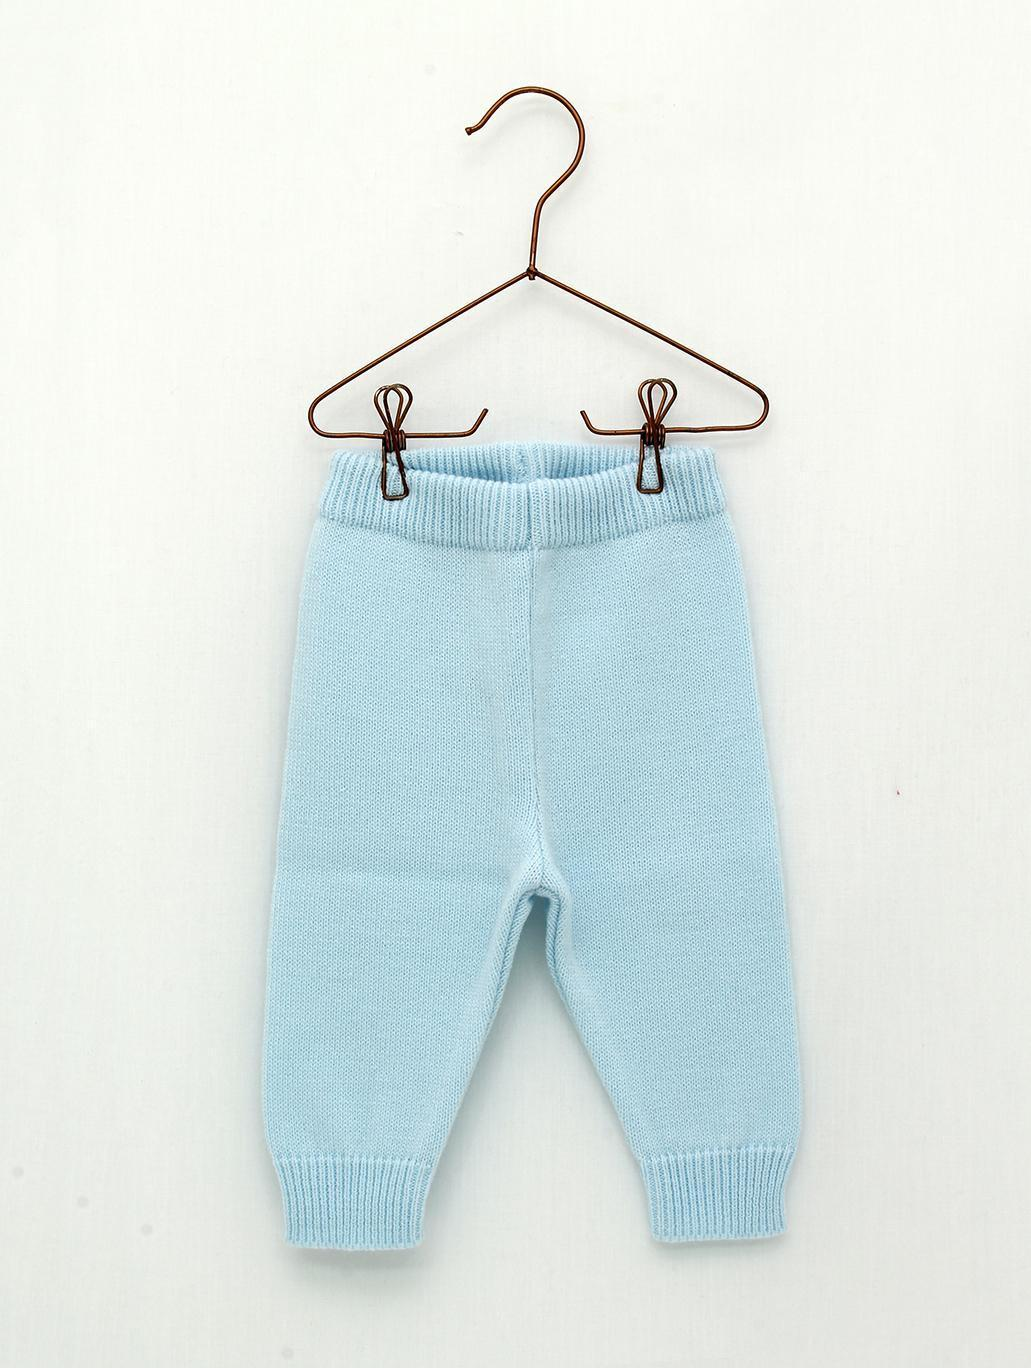 Pantalón largo Foque sin pies color azul celeste.